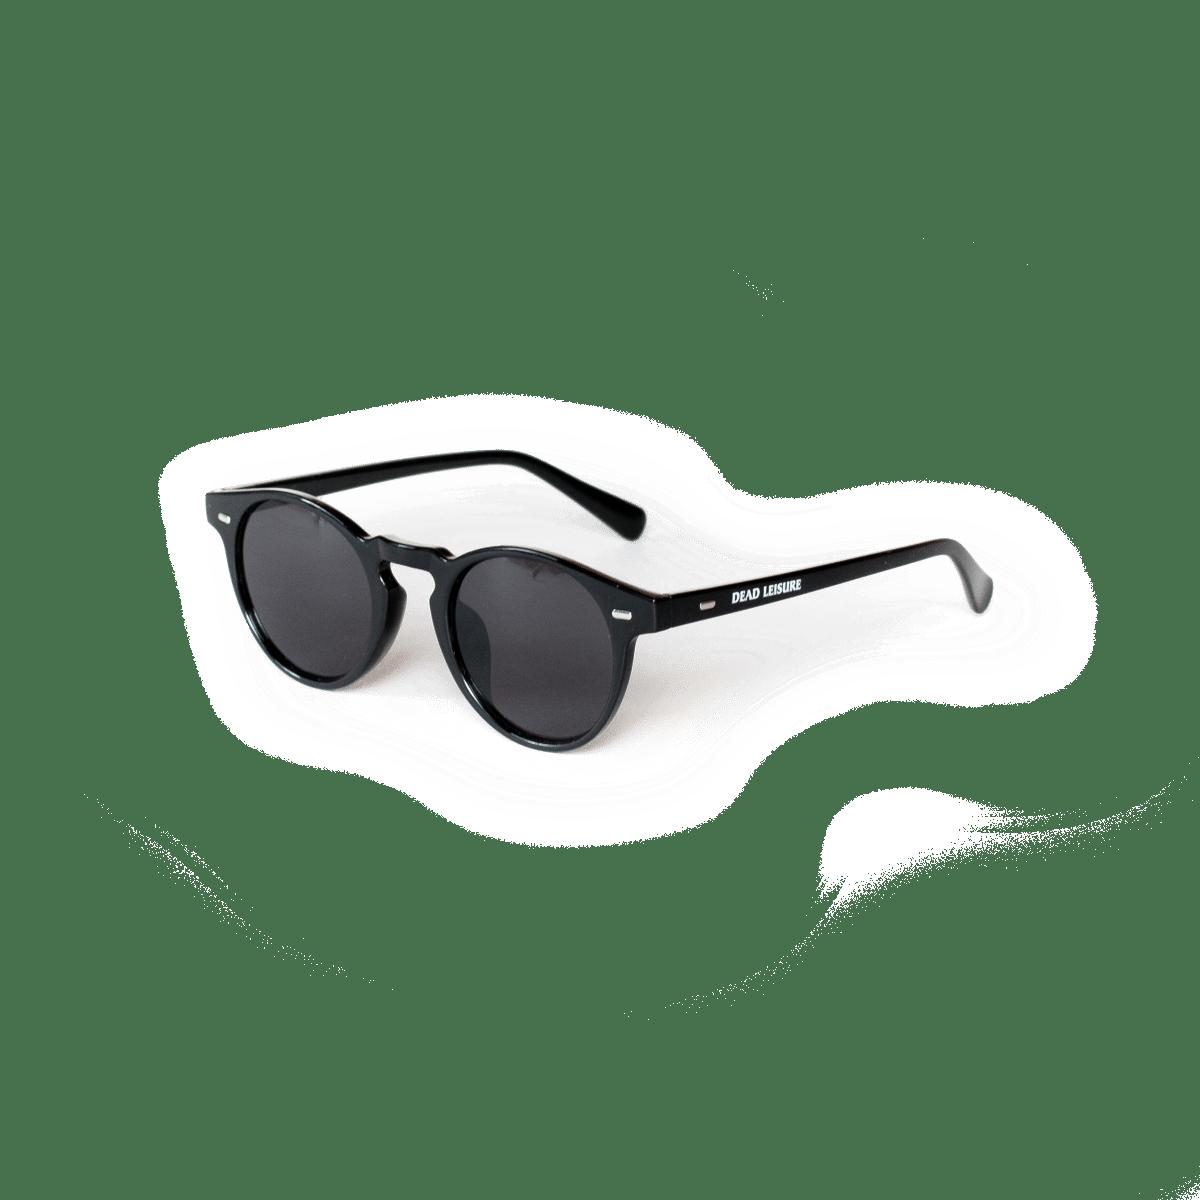 Interpreters Sunglasses - Black